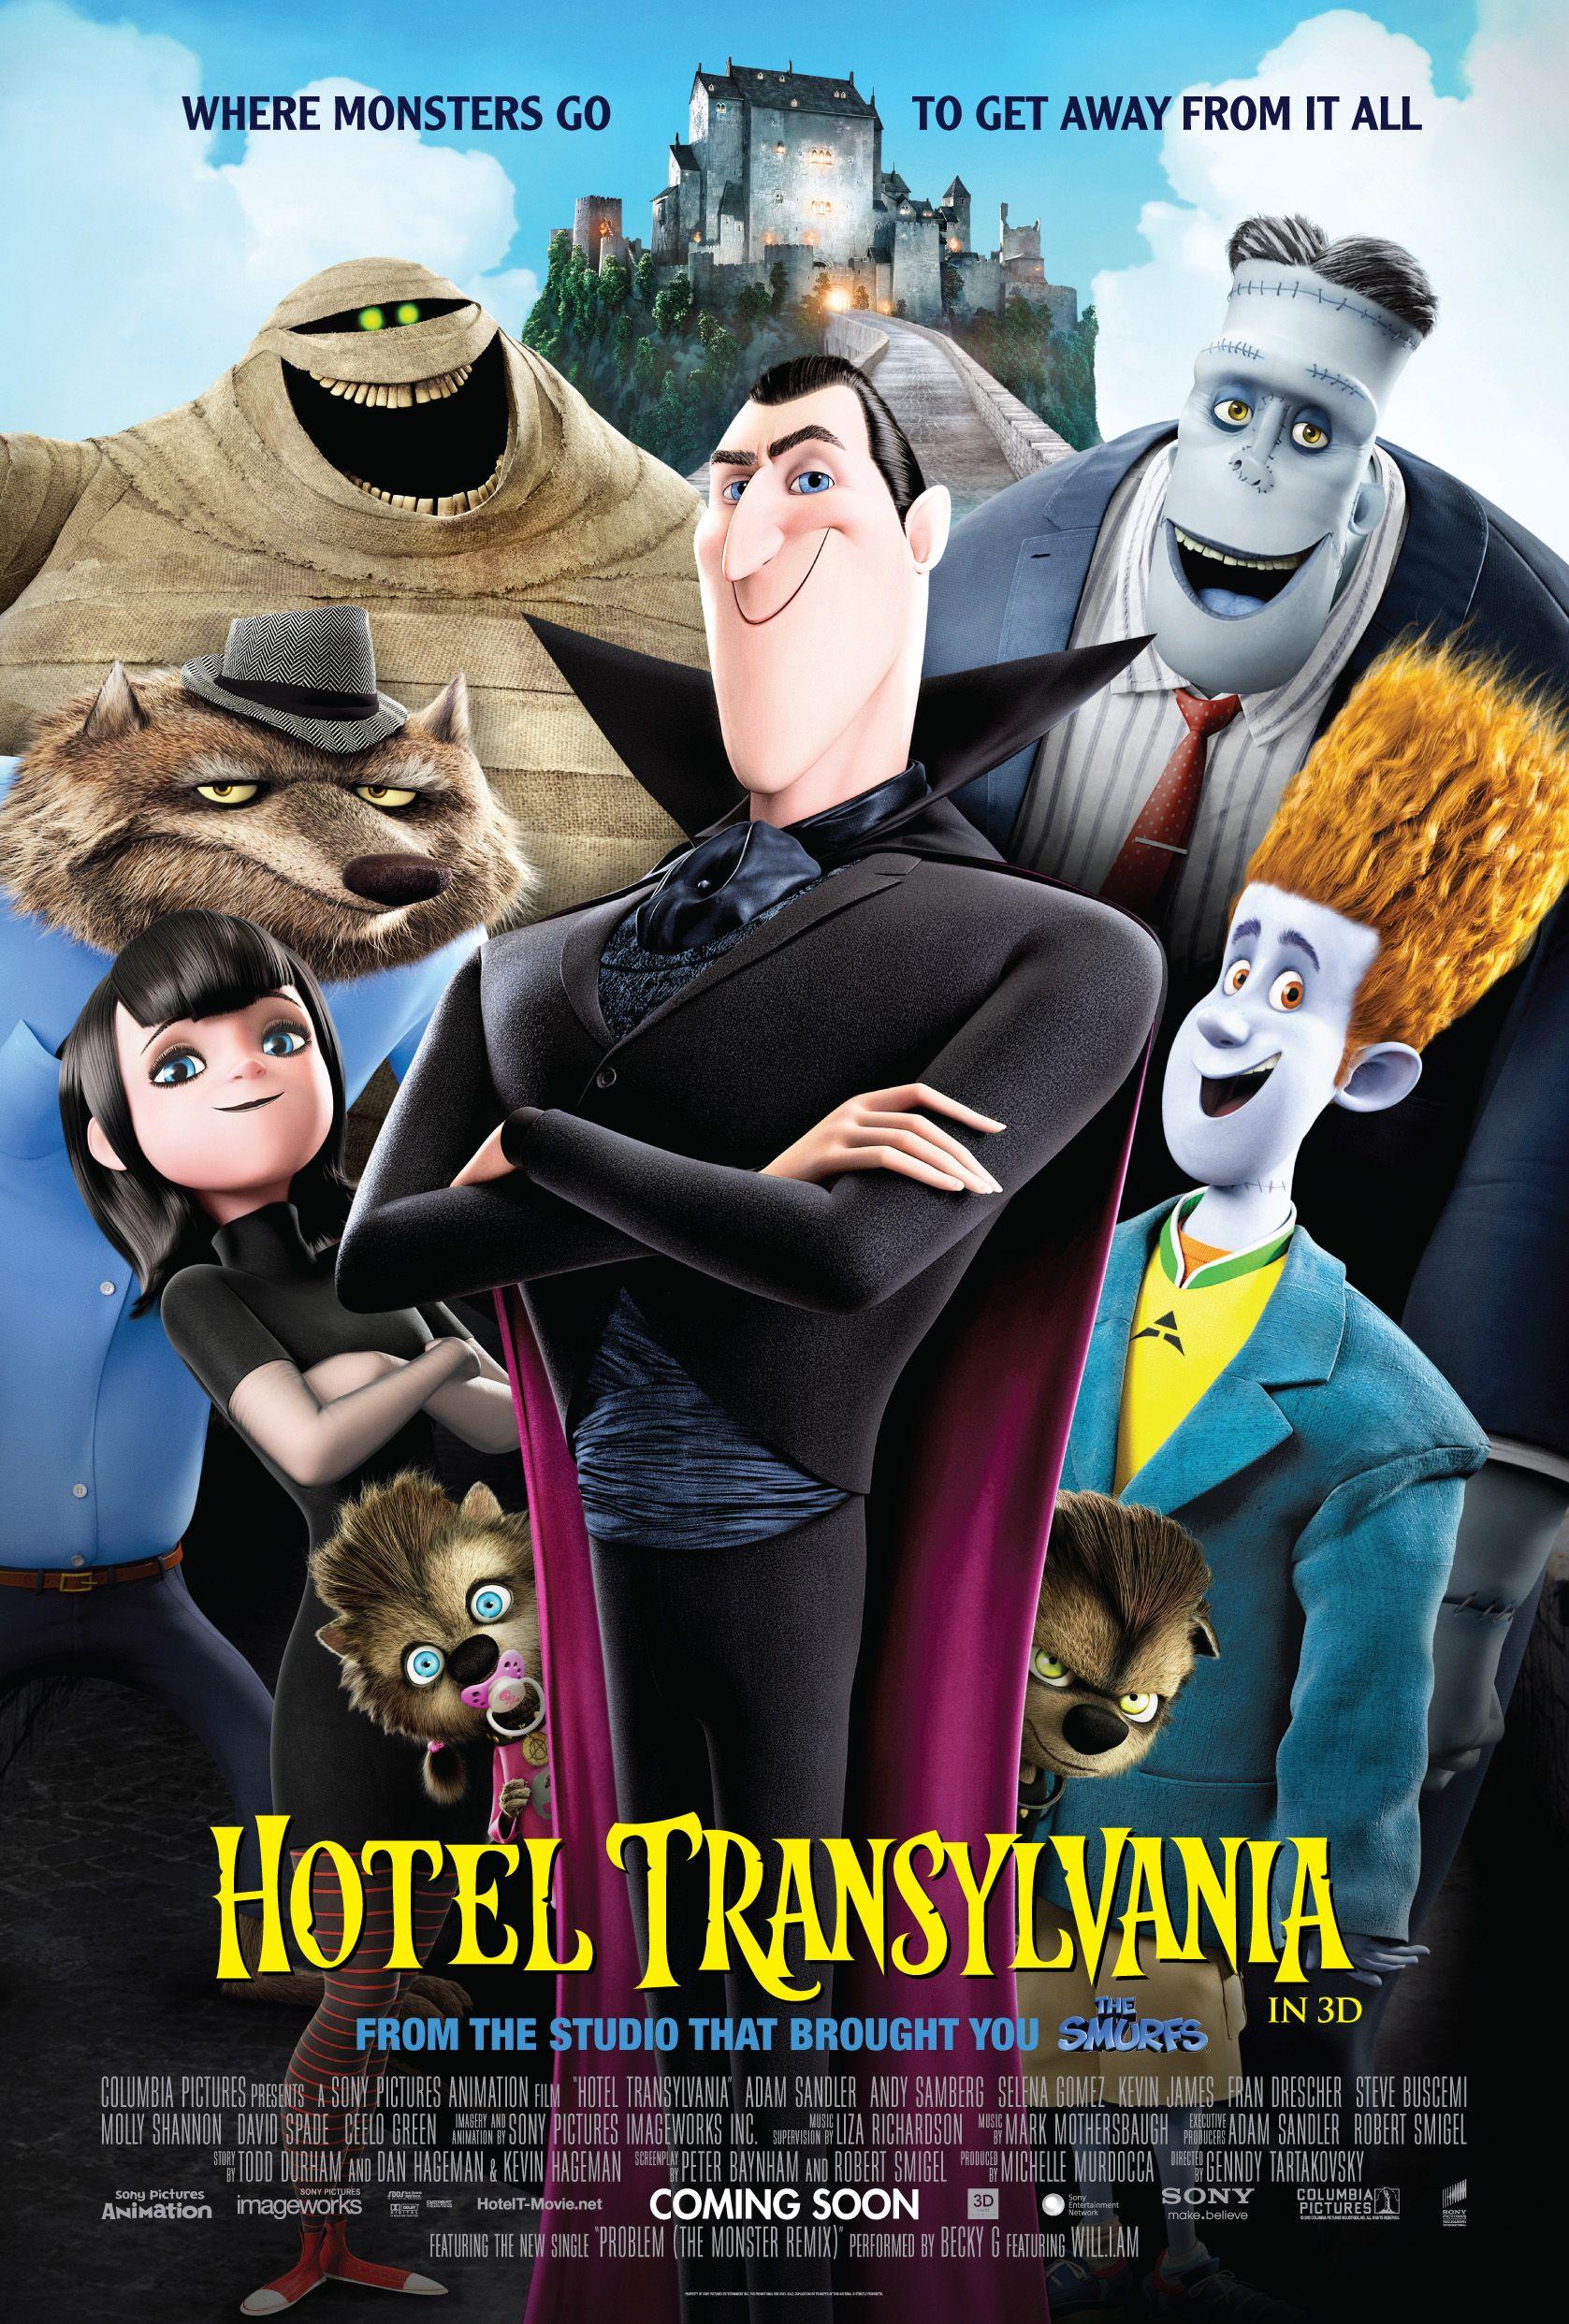 in Showcase Cinemas Hotel transylvania, Transylvania